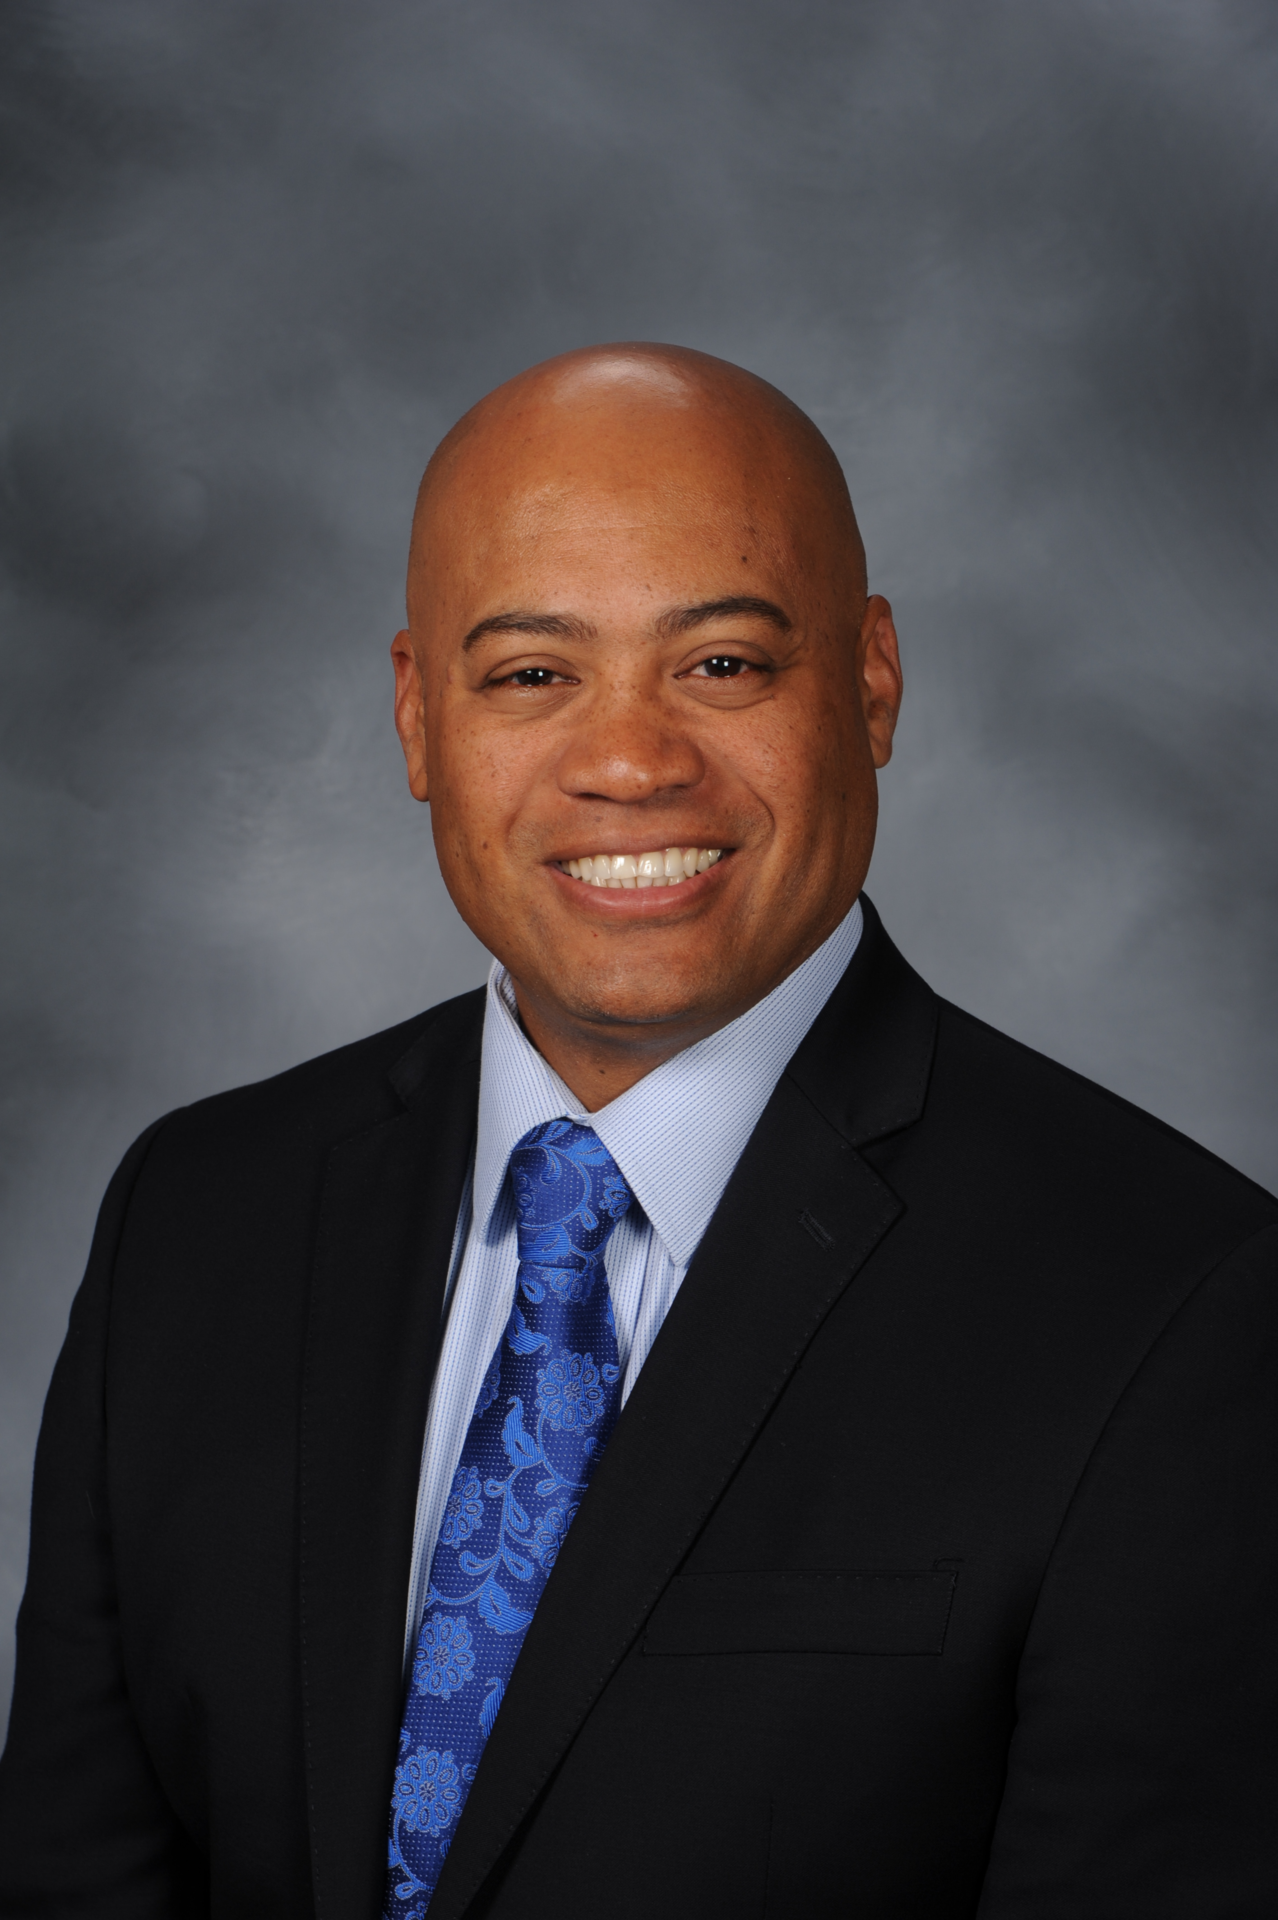 Superintendent Terrence Davis